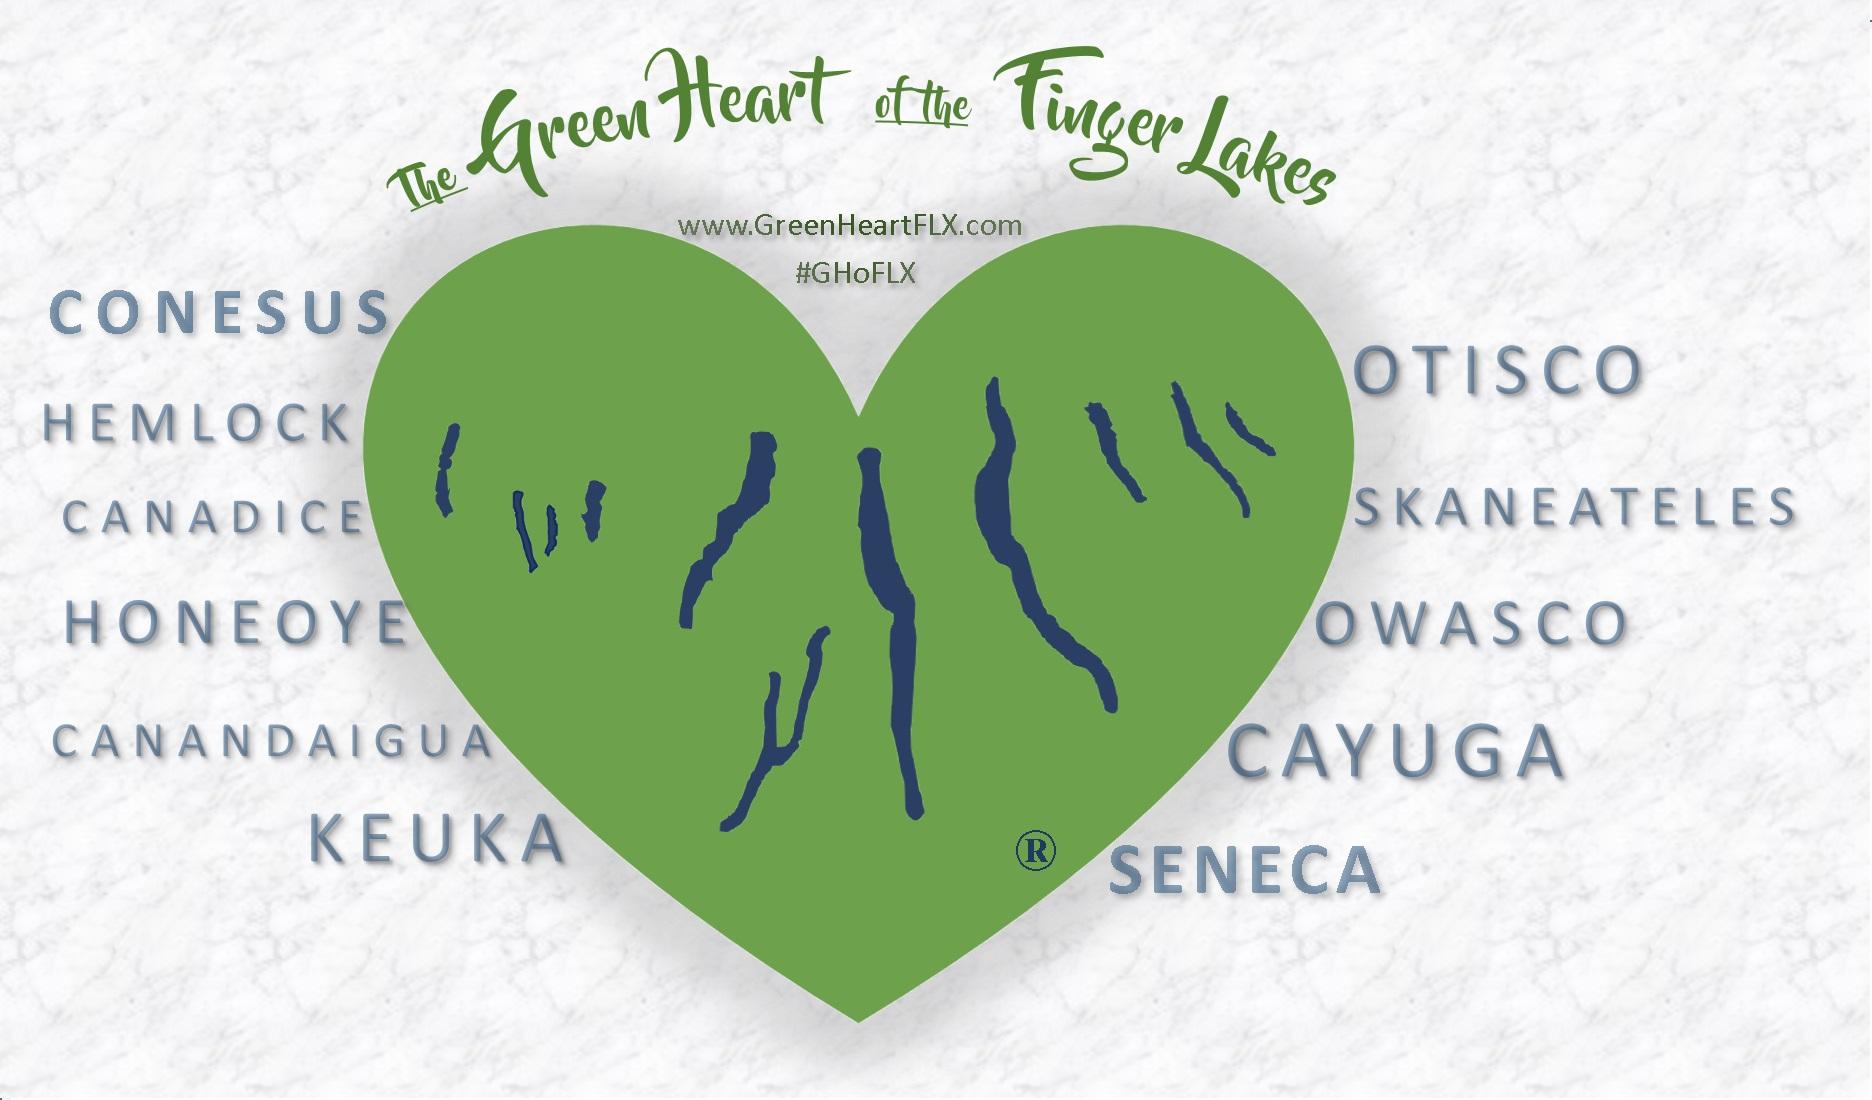 East to West:Otisco | Skaneateles | Owasco | Cayuga |Seneca | Keuka | Canandaigua| Honeoye | Canadice | Hemlock | Conesus -